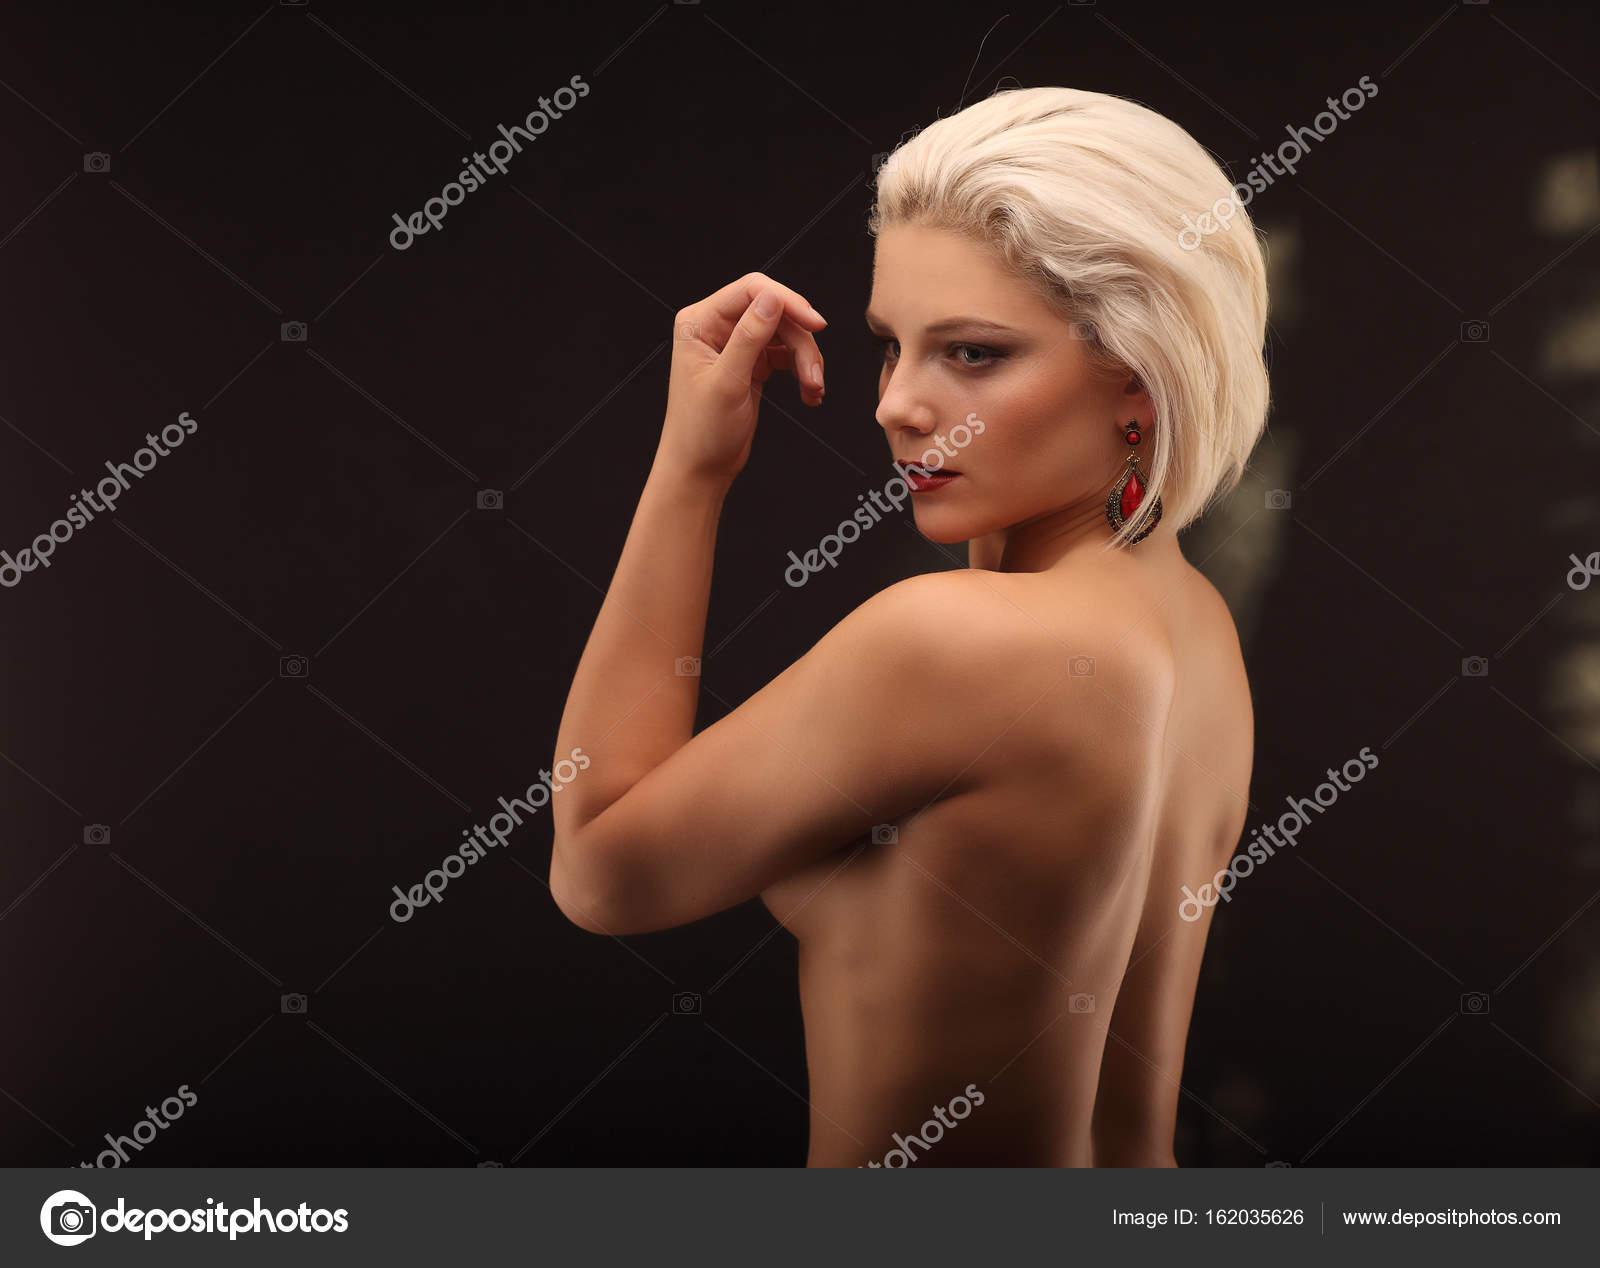 Nackt modell nudes (28 photo), Instagram Celebrity image